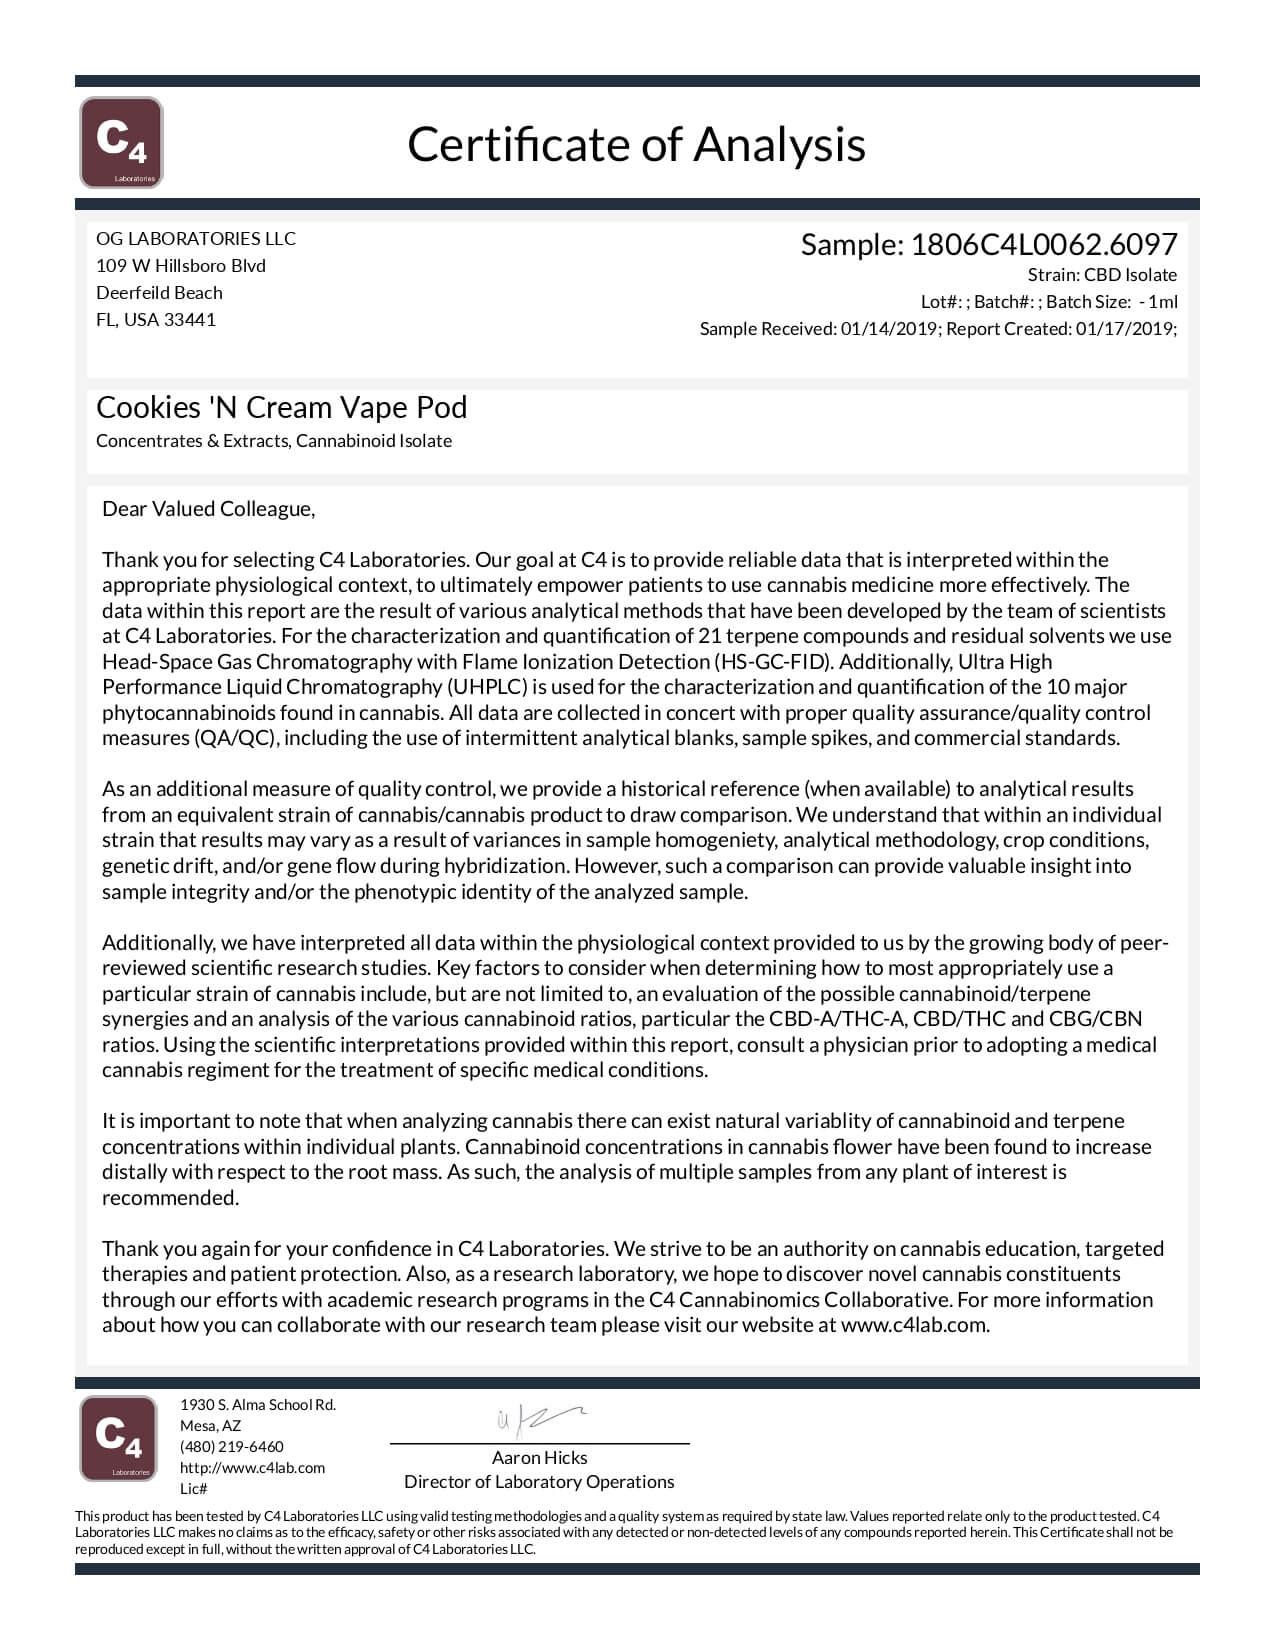 OG Labs CBD Pod Cookies N Cream Lab Report